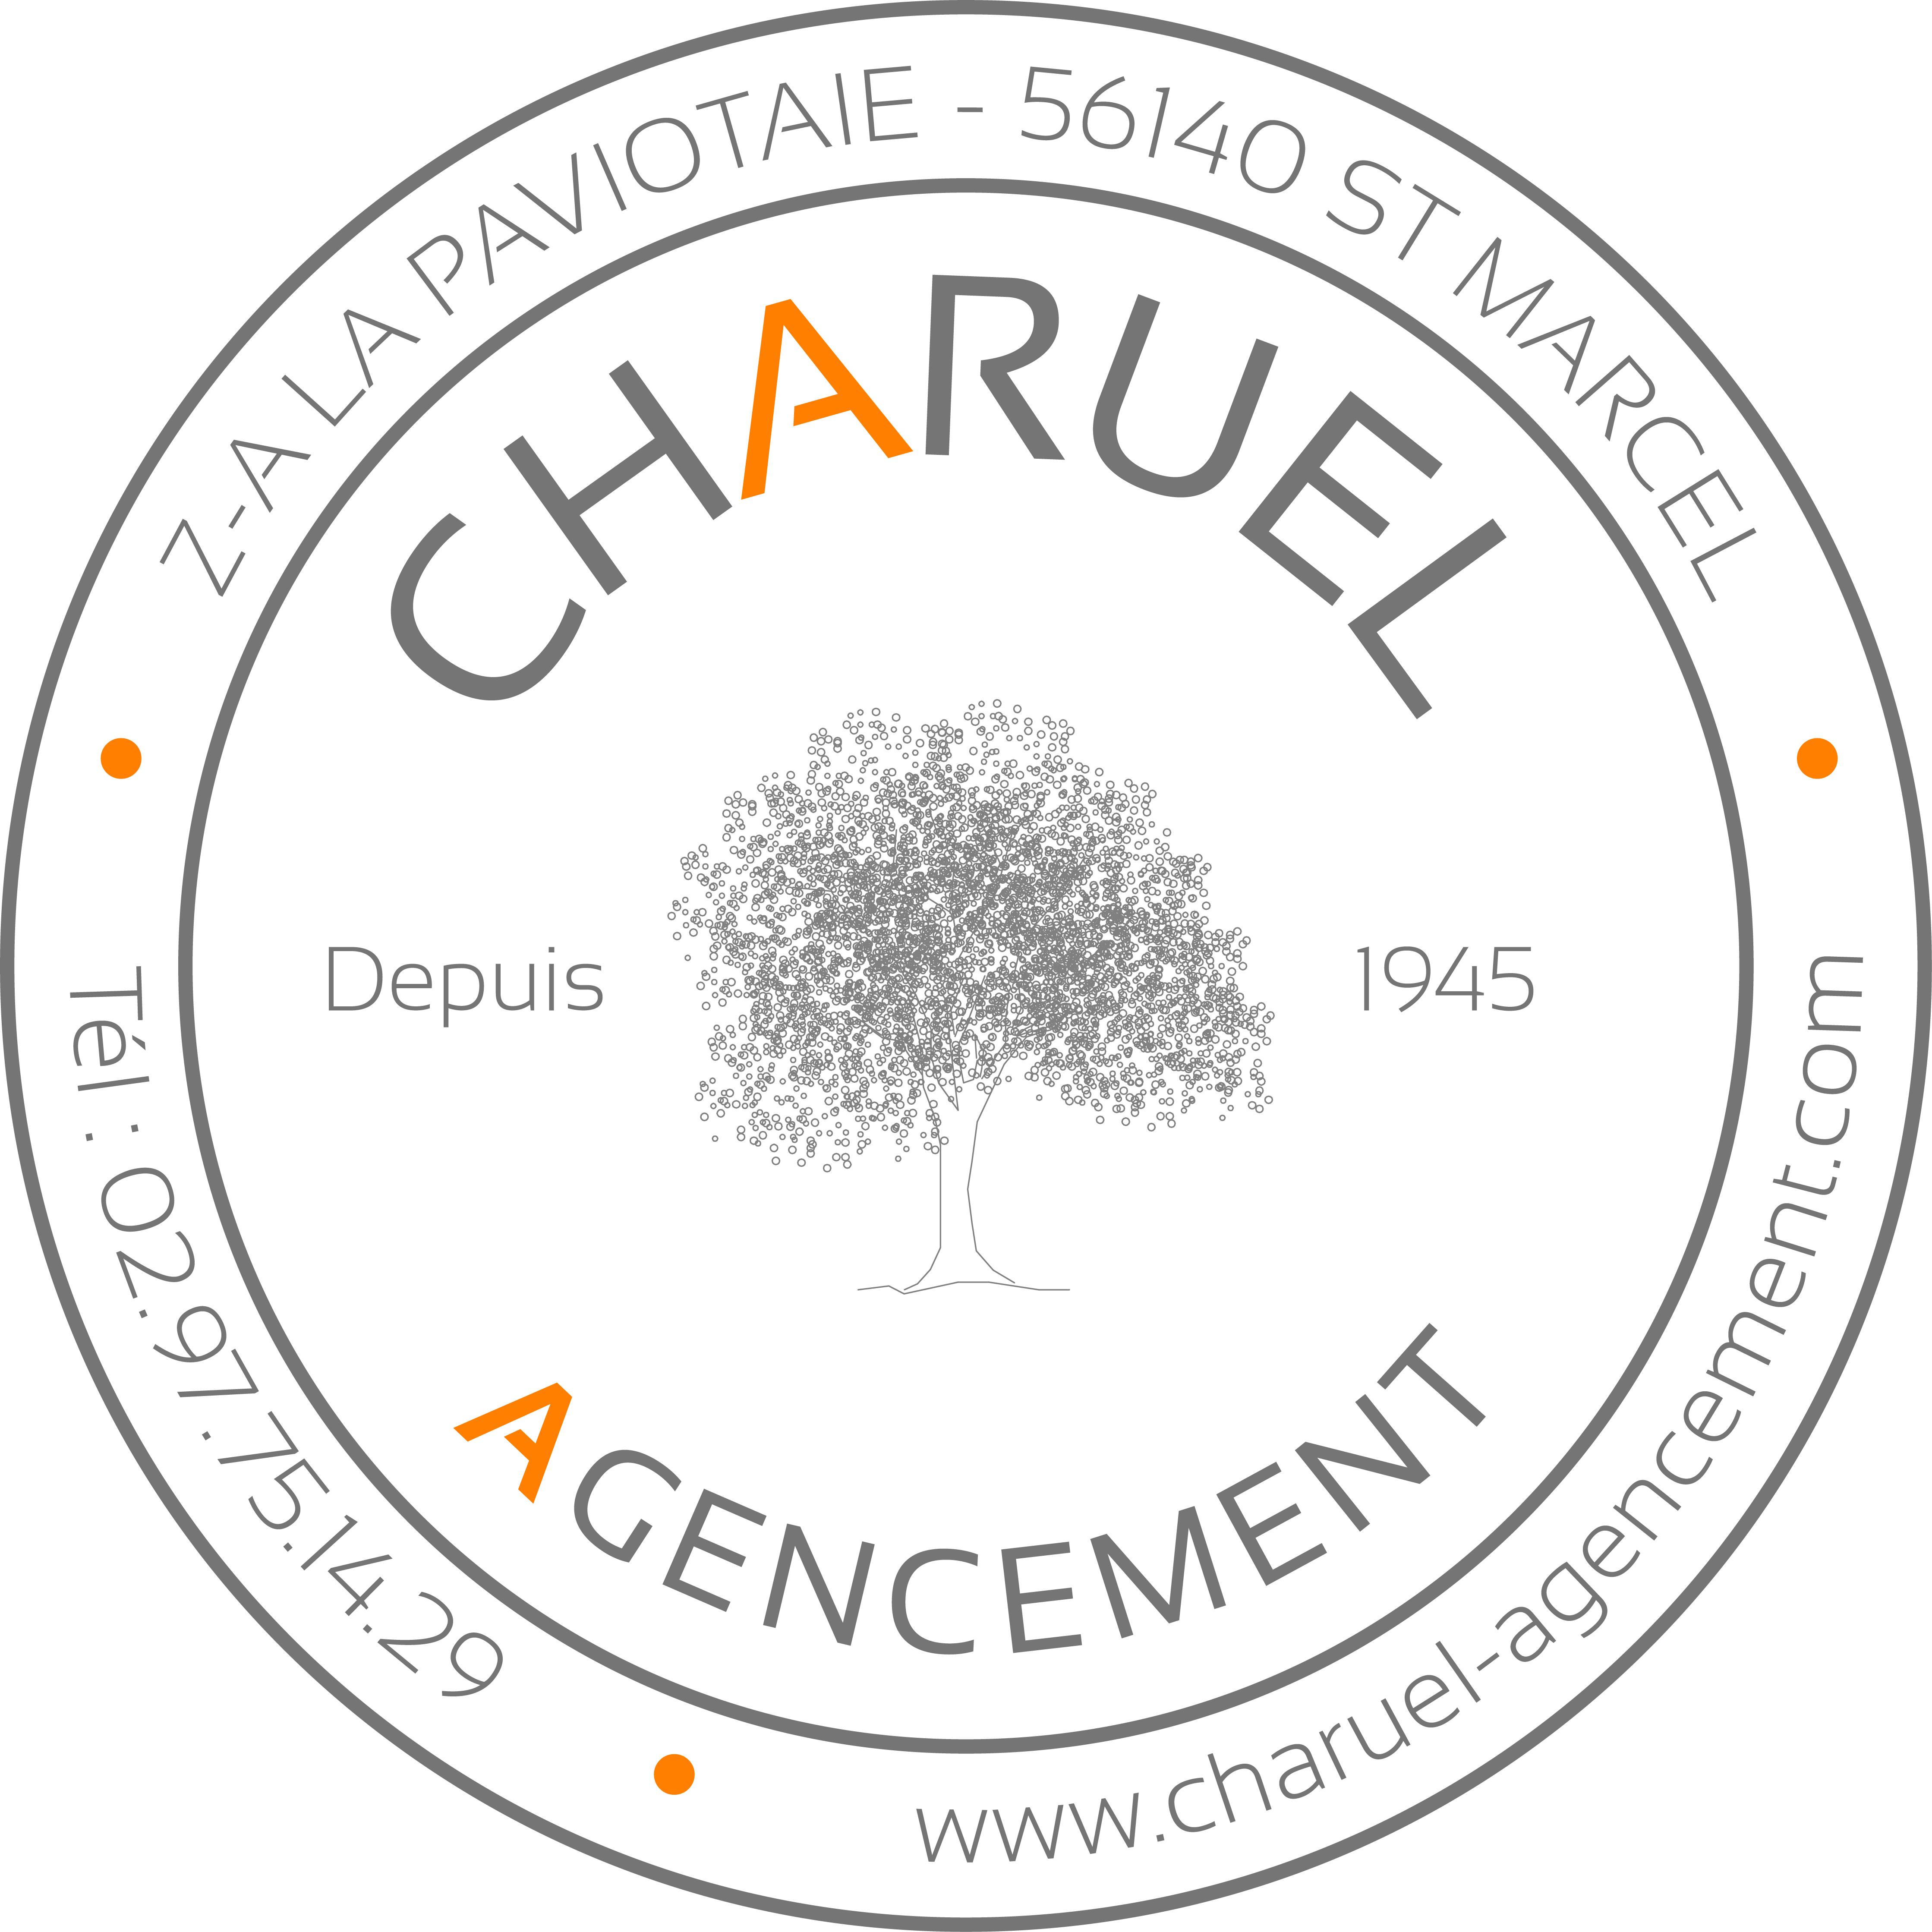 logo_Charuel - version complete(1).jpg